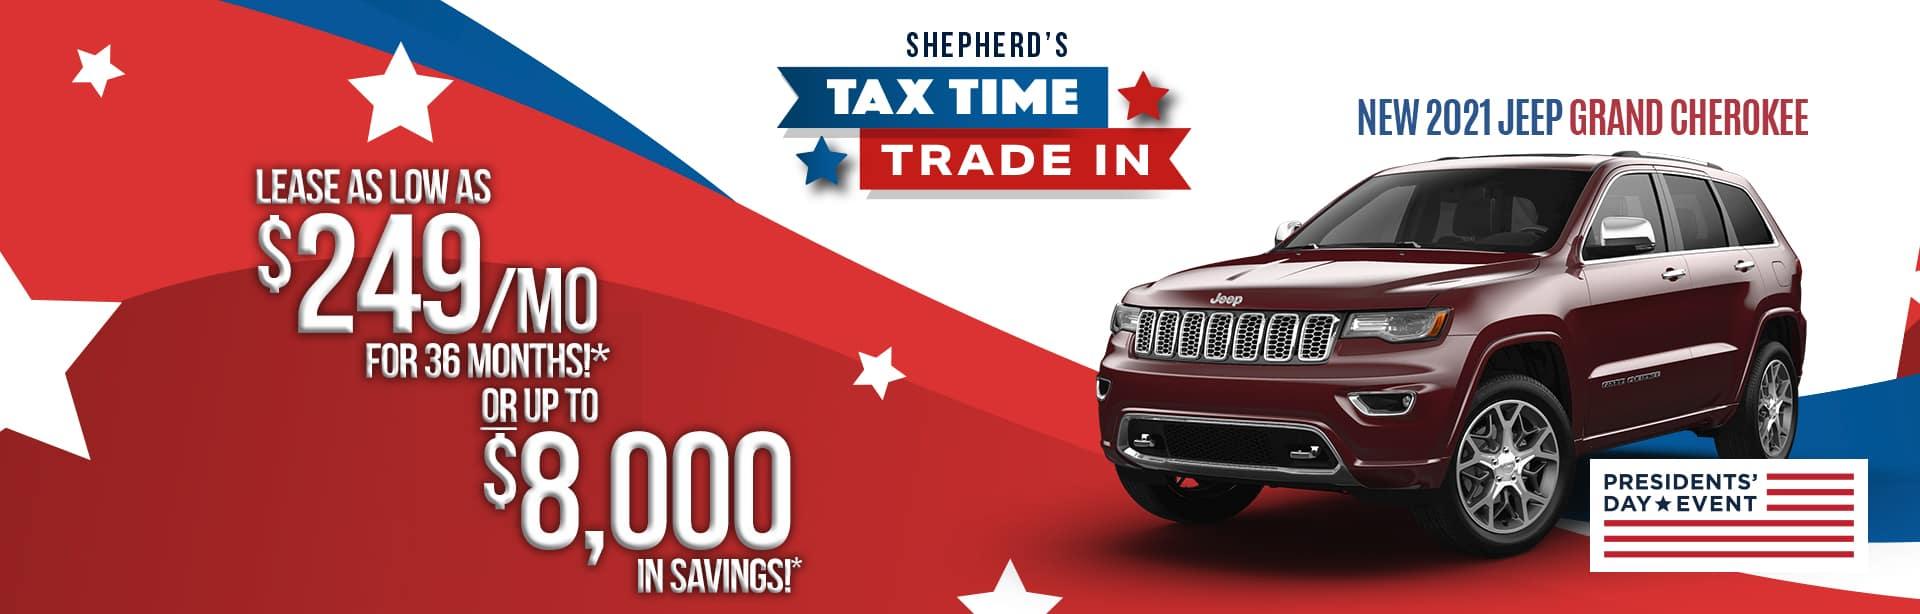 Best lease deal on a new 2021 Jeep Grand Cherokee near Auburn Indiana